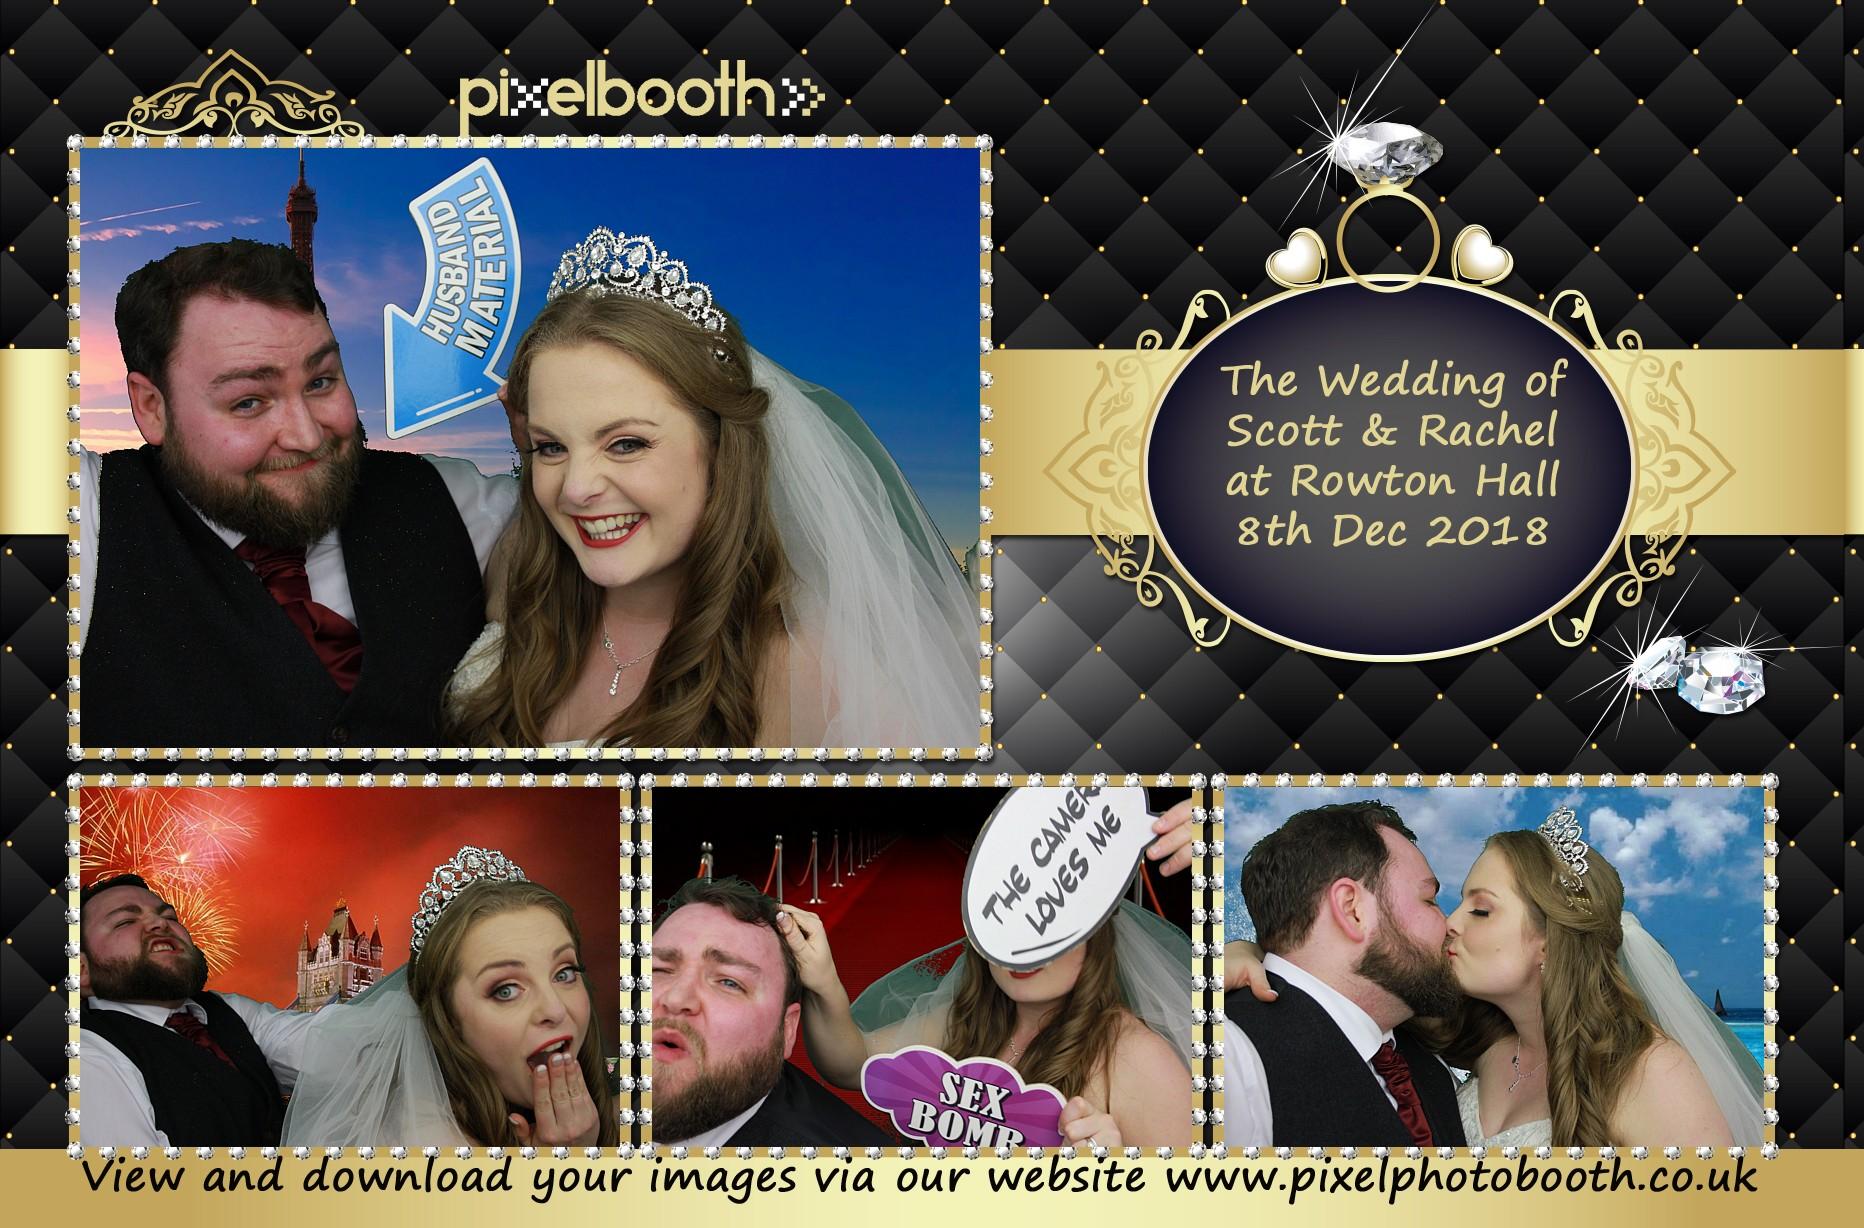 8th Dec 2018: Scott and Rachel's Wedding at Rowton Hall